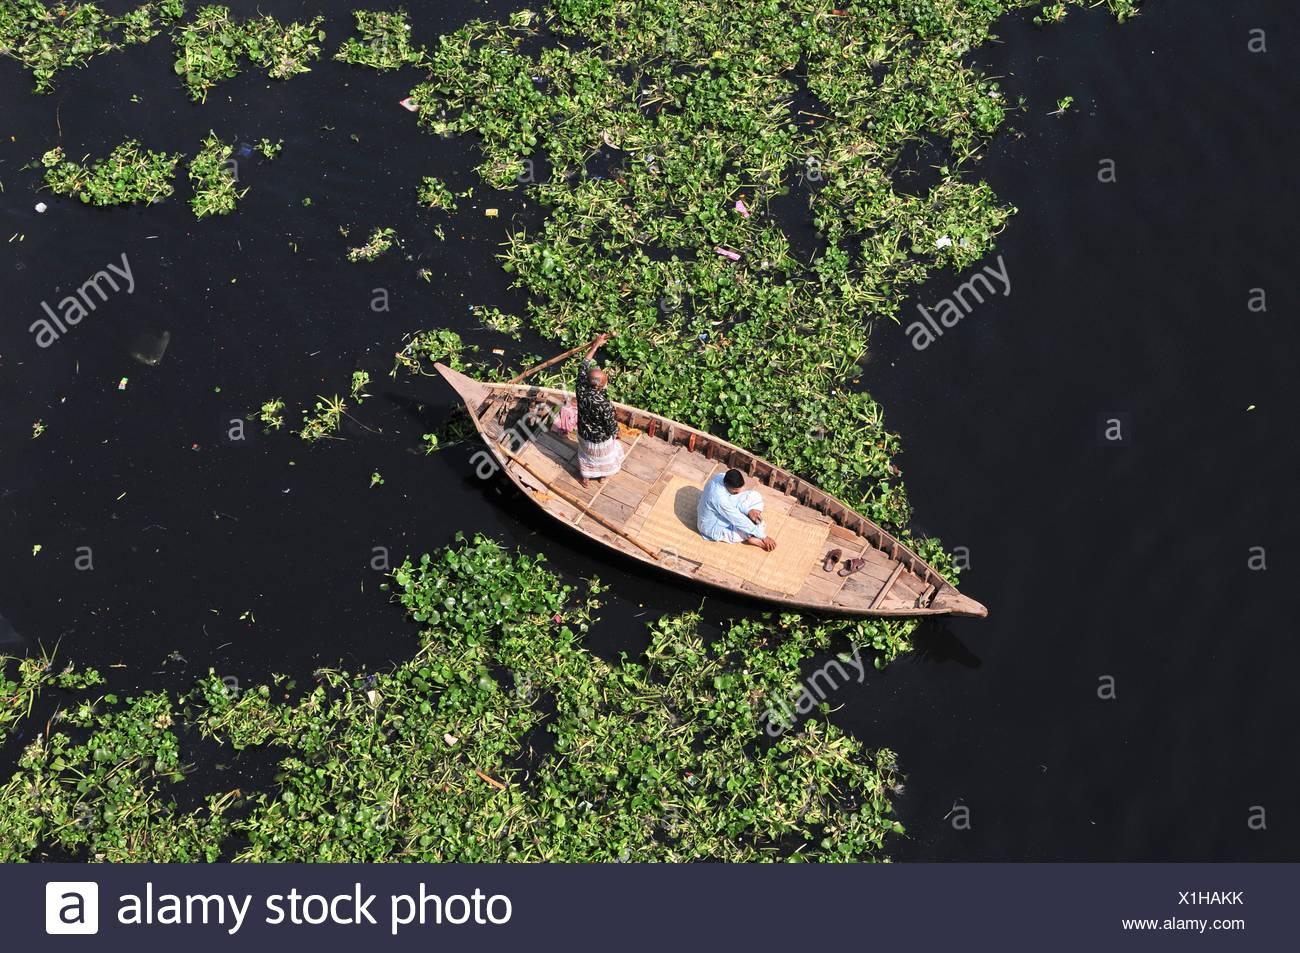 Bangladesh, Dhaka, boat on Brahmaputra river - Stock Image